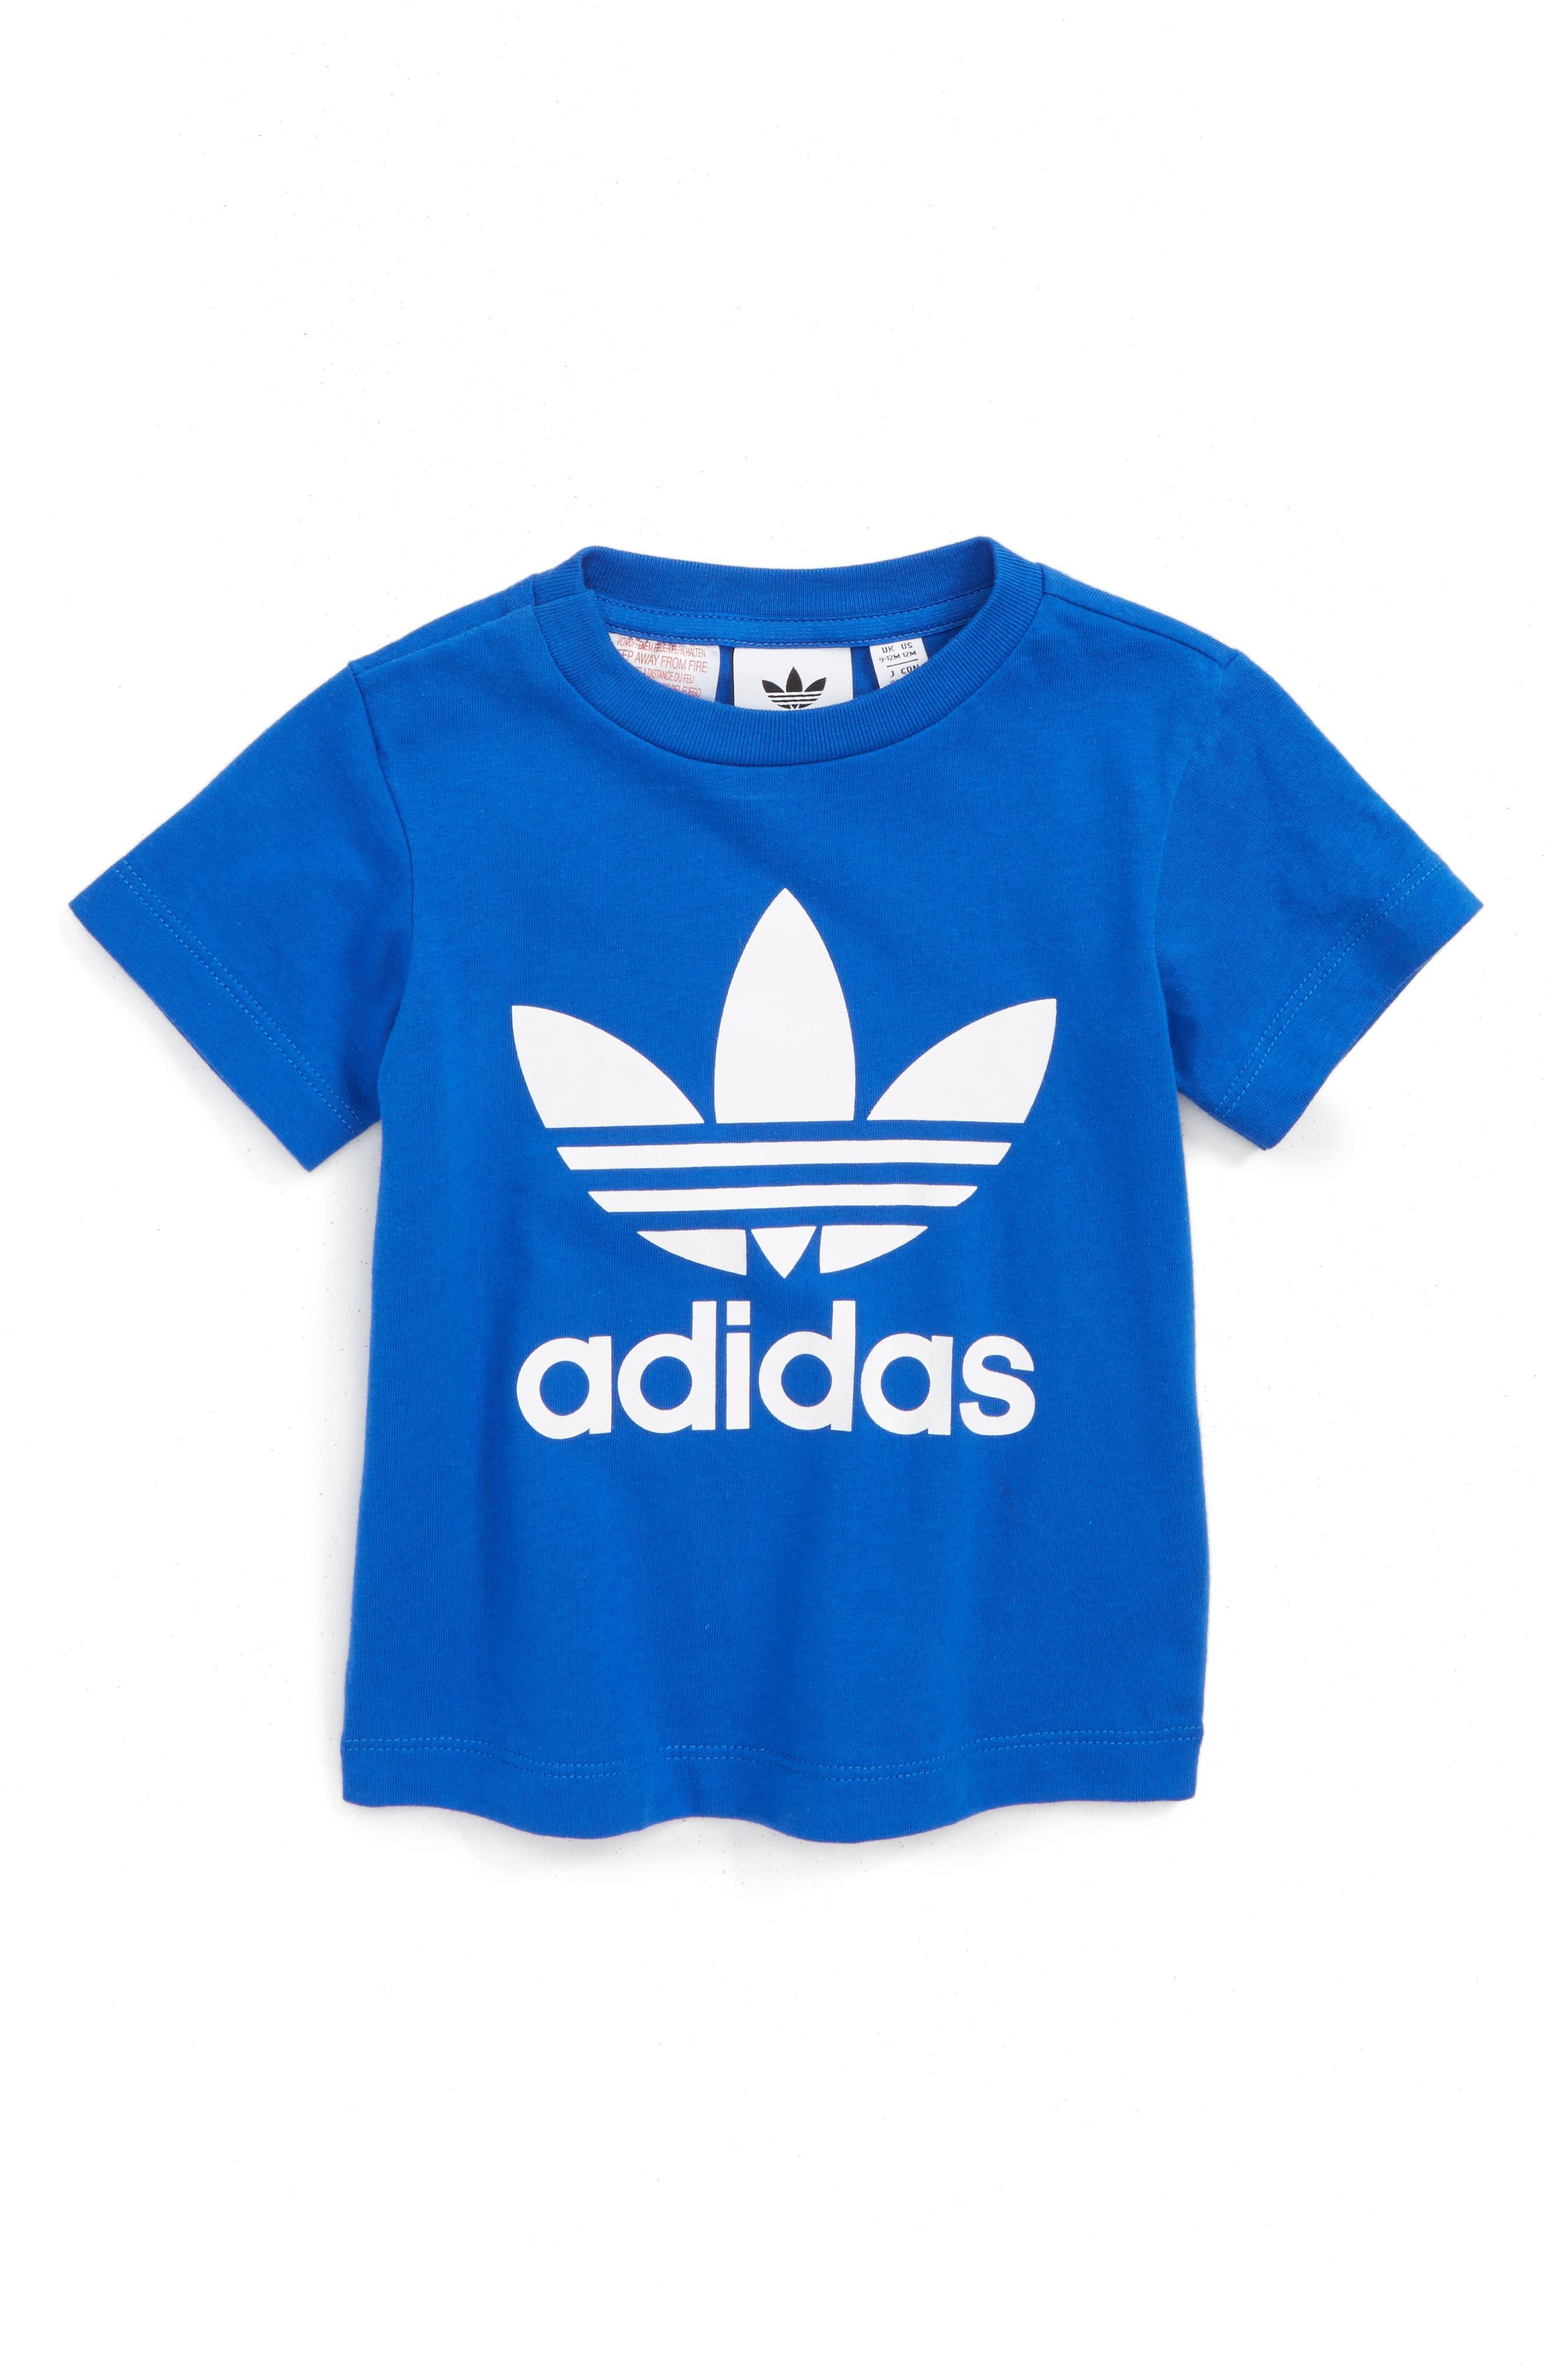 adidas Originals Trefoil Logo T-Shirt (Baby Boys)